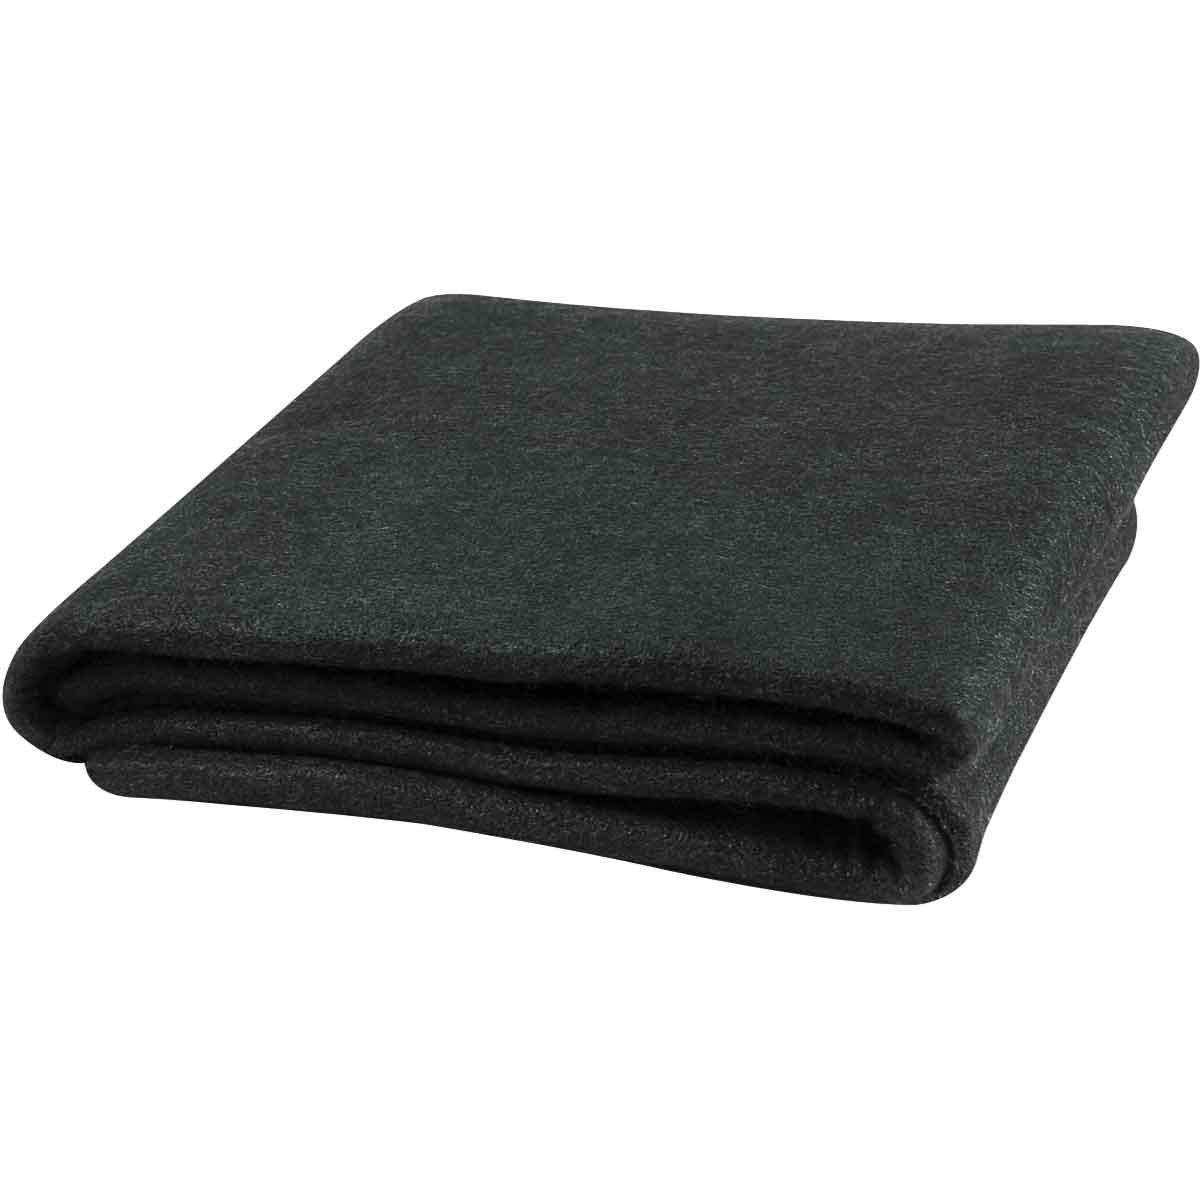 Steiner 316-3X4 Velvet Shield 16 oz Black Carbonized Fiber Welding Blanket, 3' x 4' by Steiner